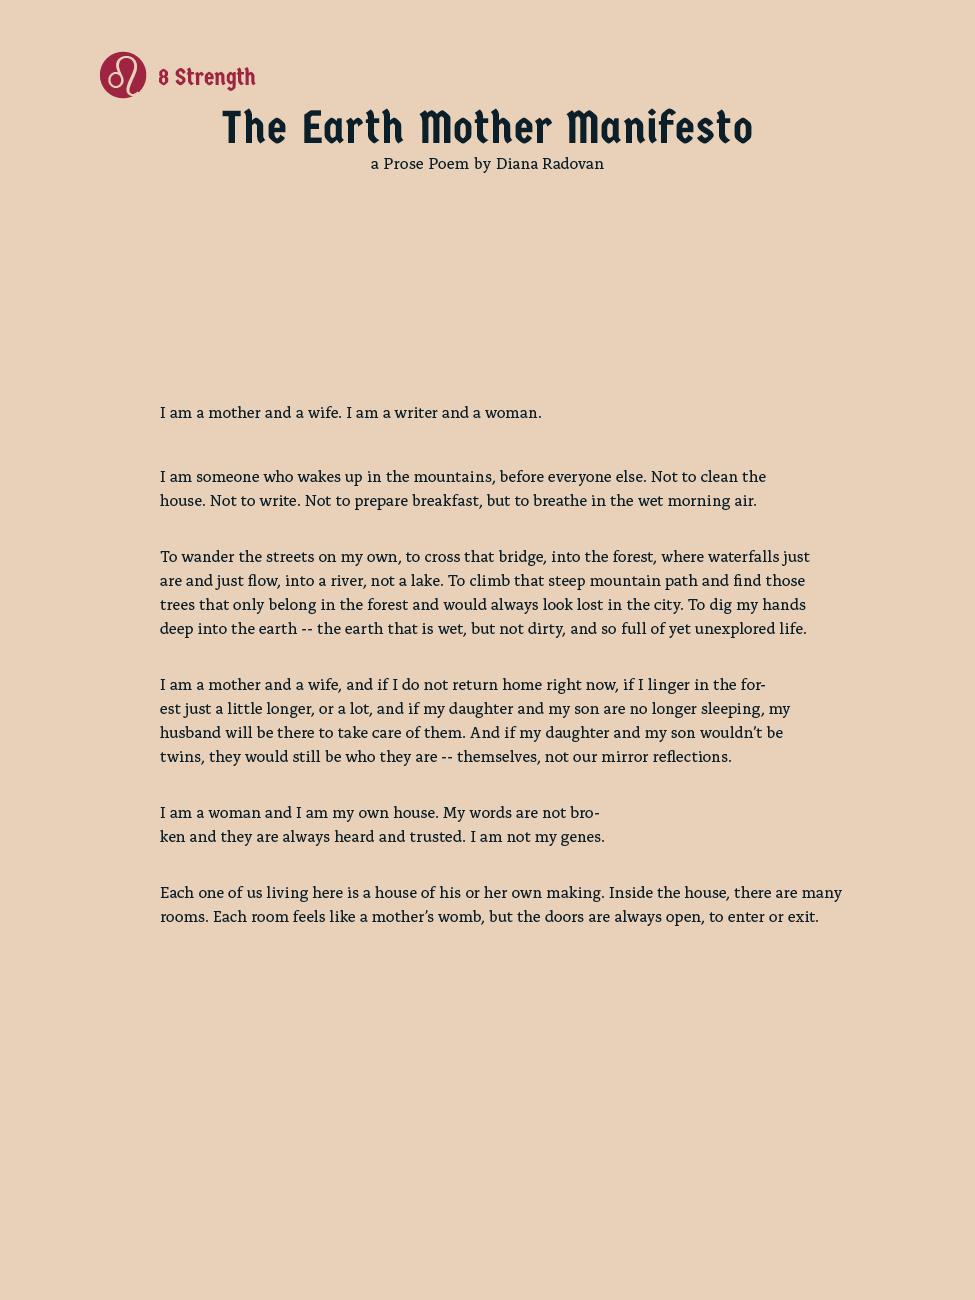 8 Strength - The Earth Mother Manifesto (a Prose Poem) - Diana Radovan